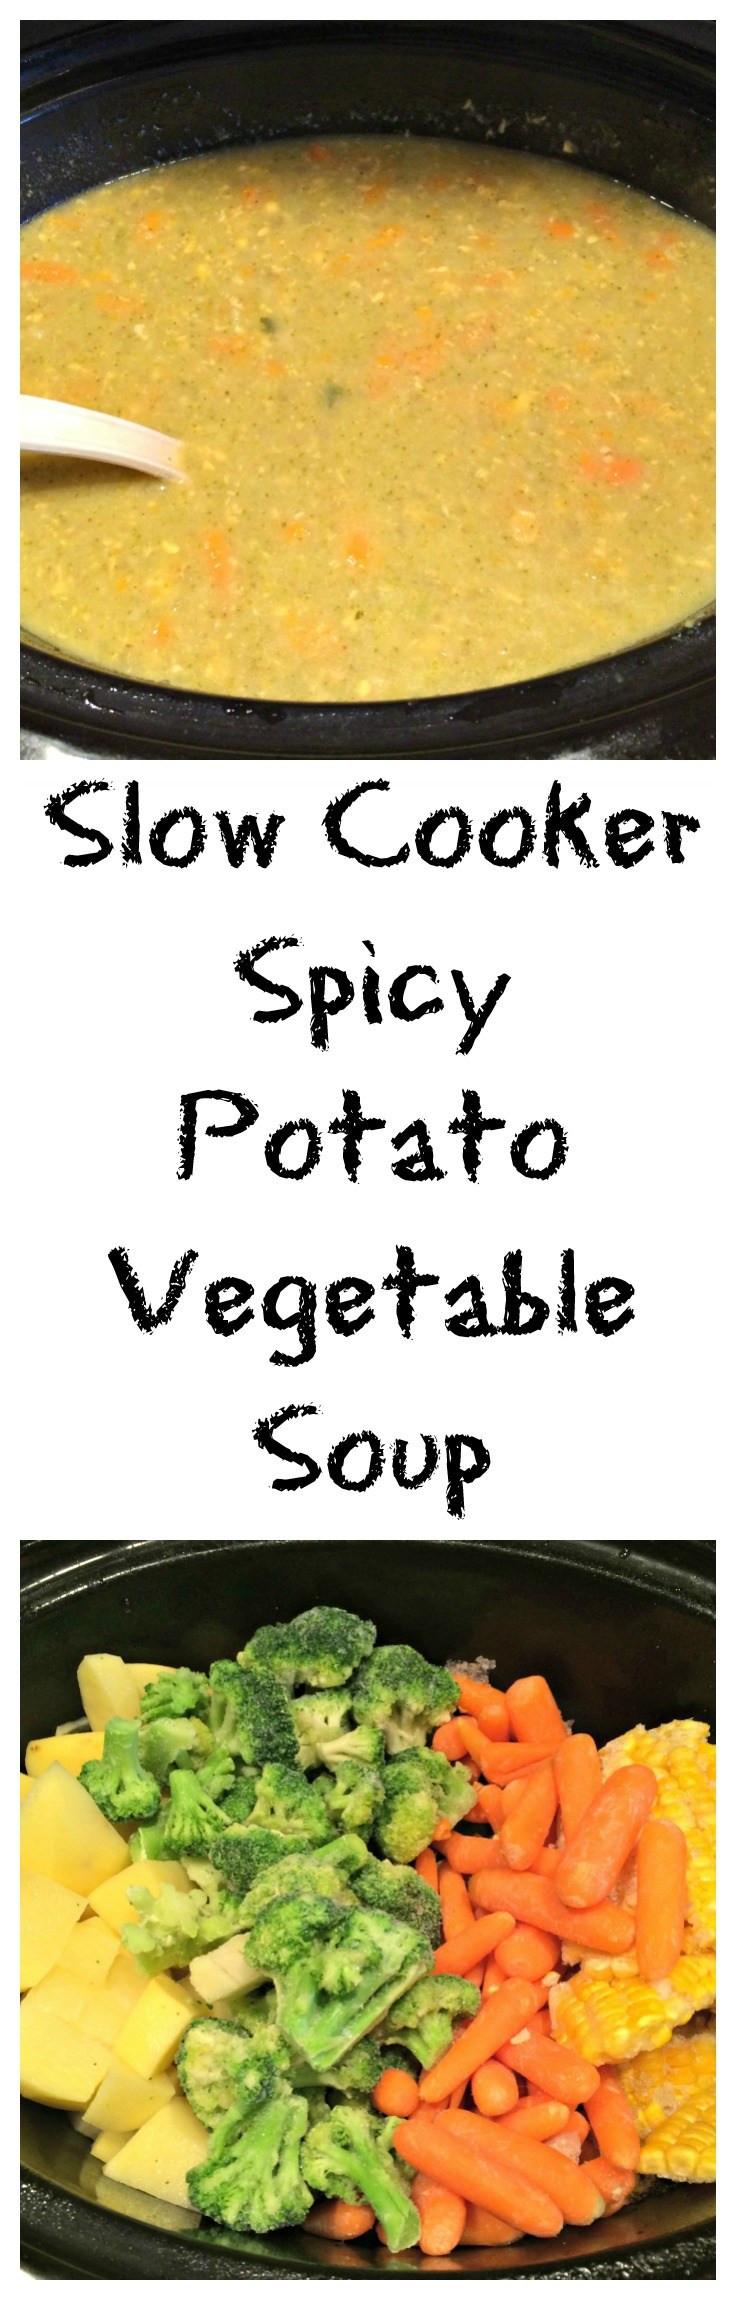 Slow Cooker Vegetarian Potato Soup  Slow Cooker Spicy Potato Ve able Soup Sweet Mornings